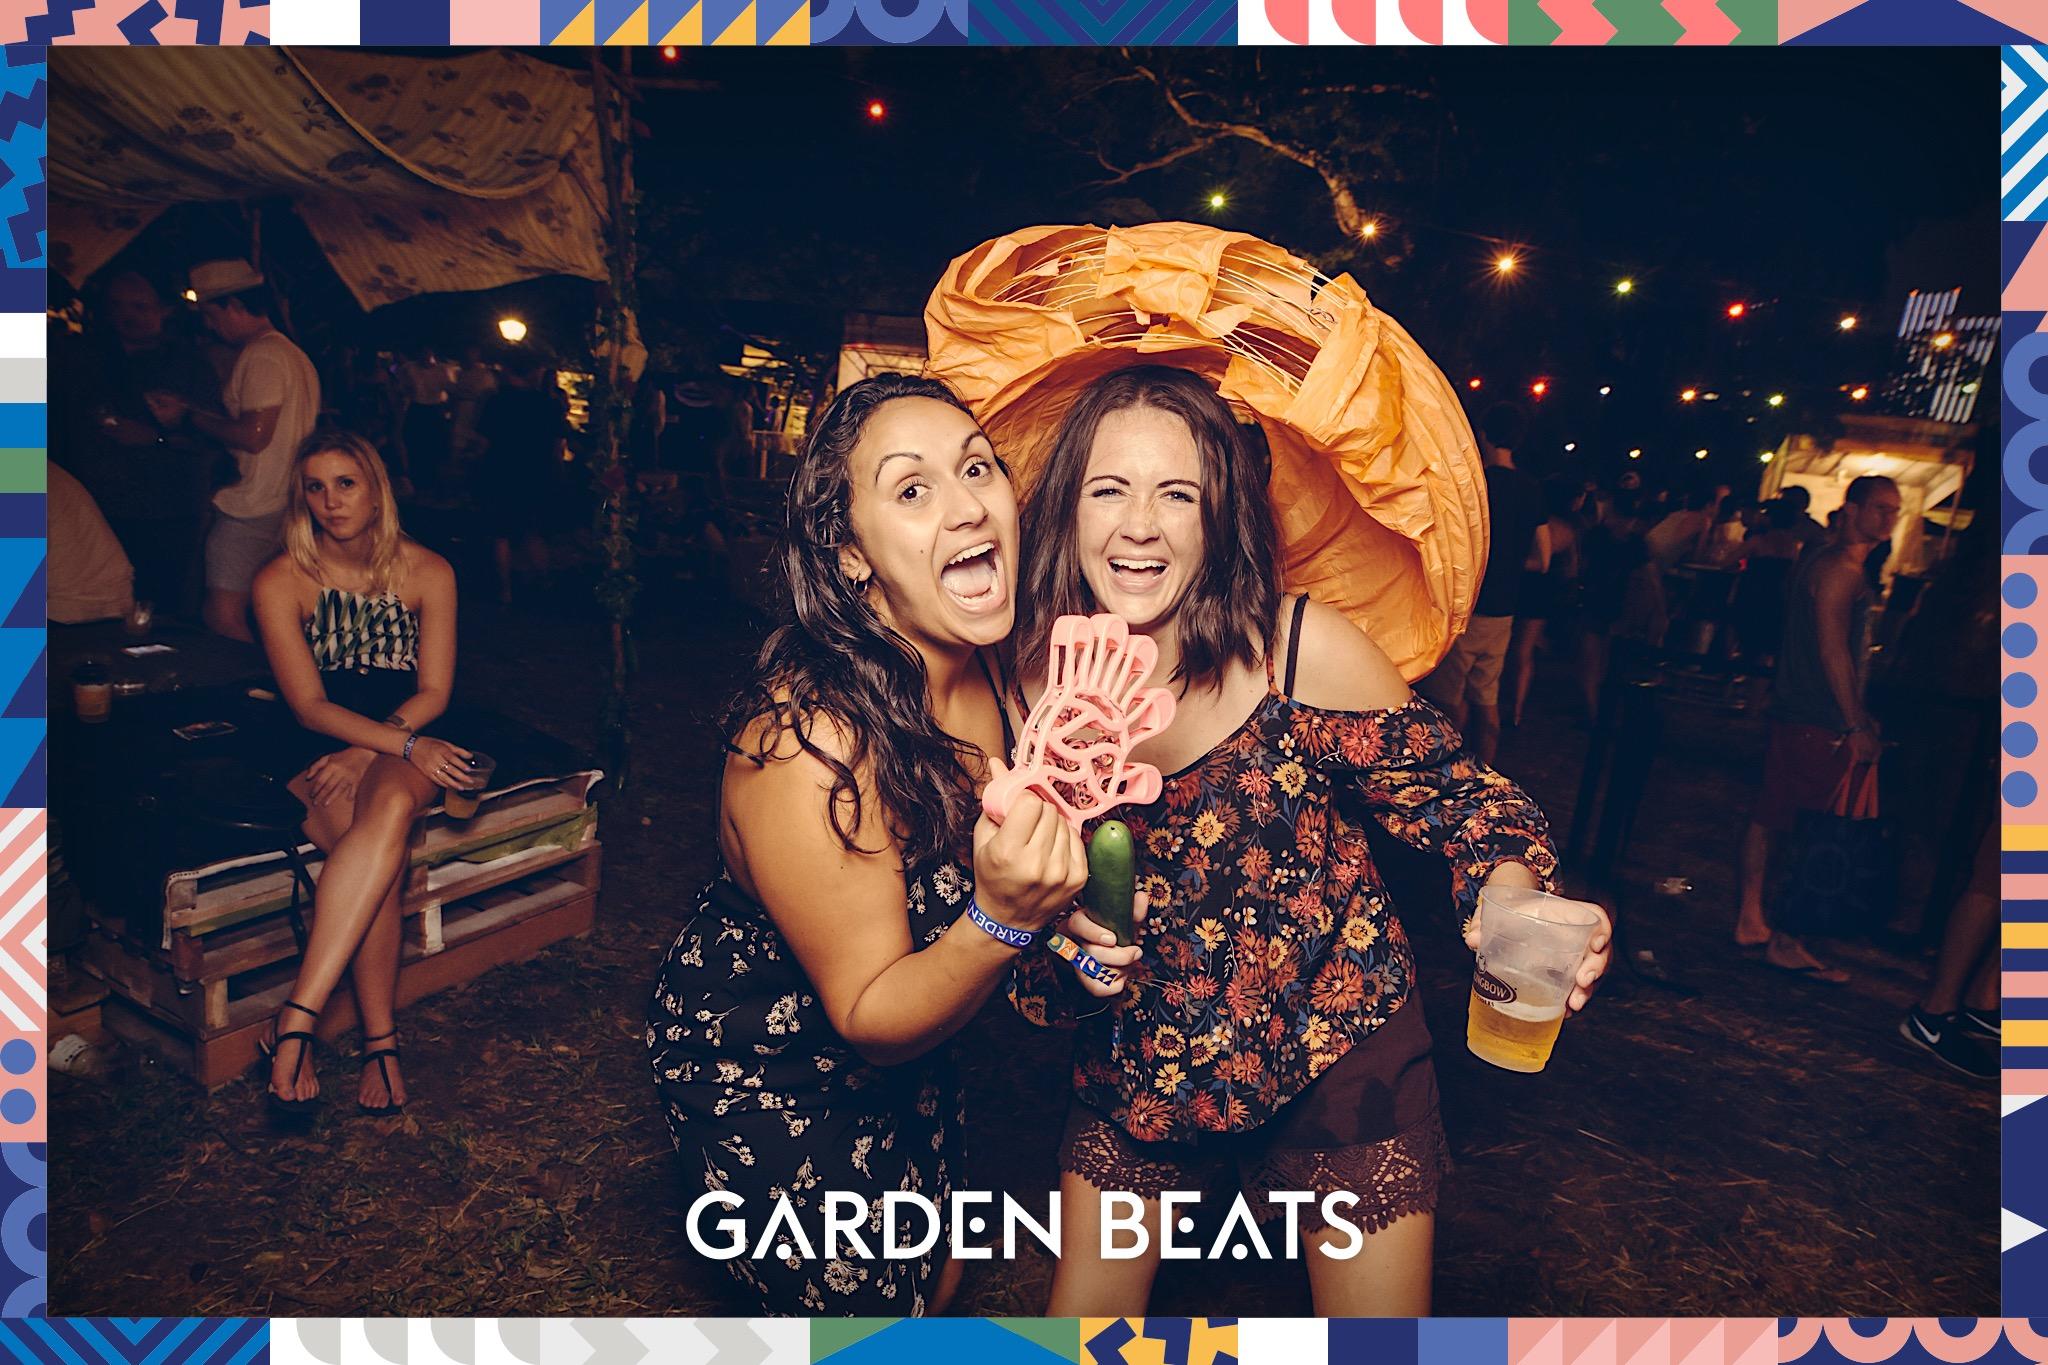 18032017_GardenBeats_Colossal839_WatermarkedGB.jpg